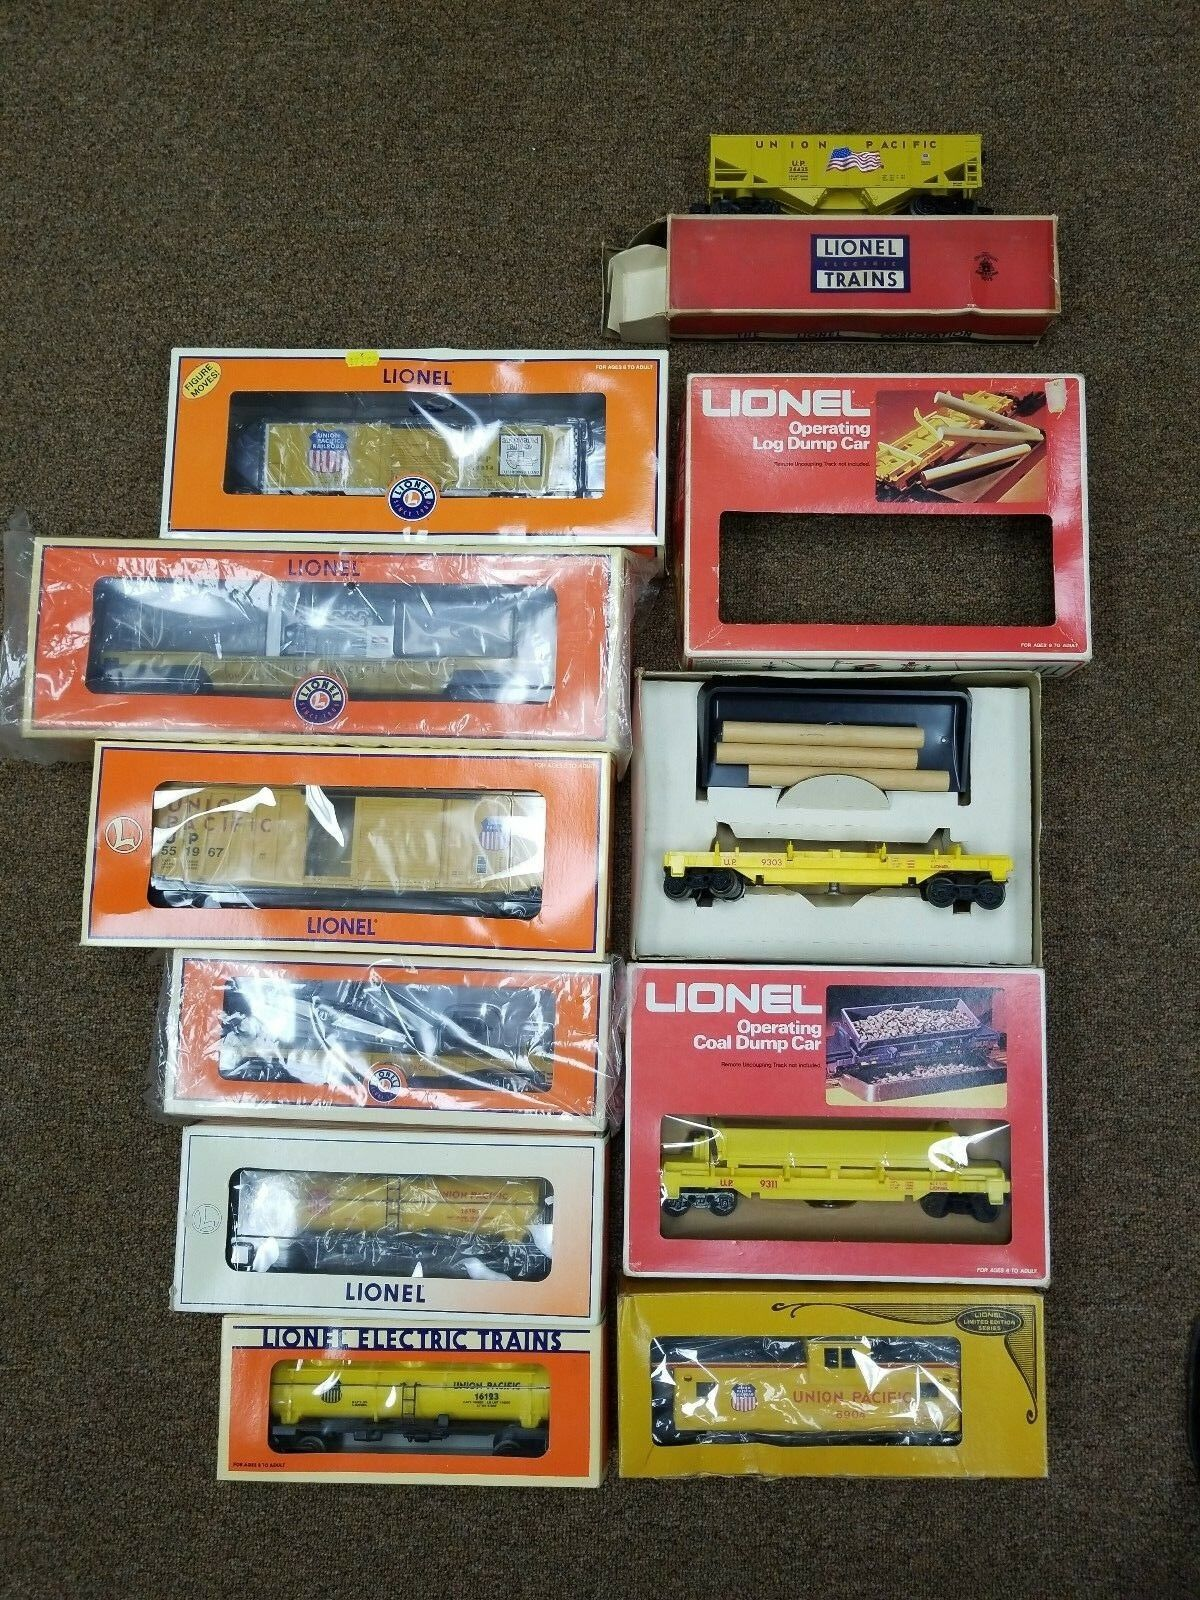 GREAT DEAL DEAL DEAL  11 Piece Lionel Union Pacific Locomotive and Freight Set + BONUS 7ec652